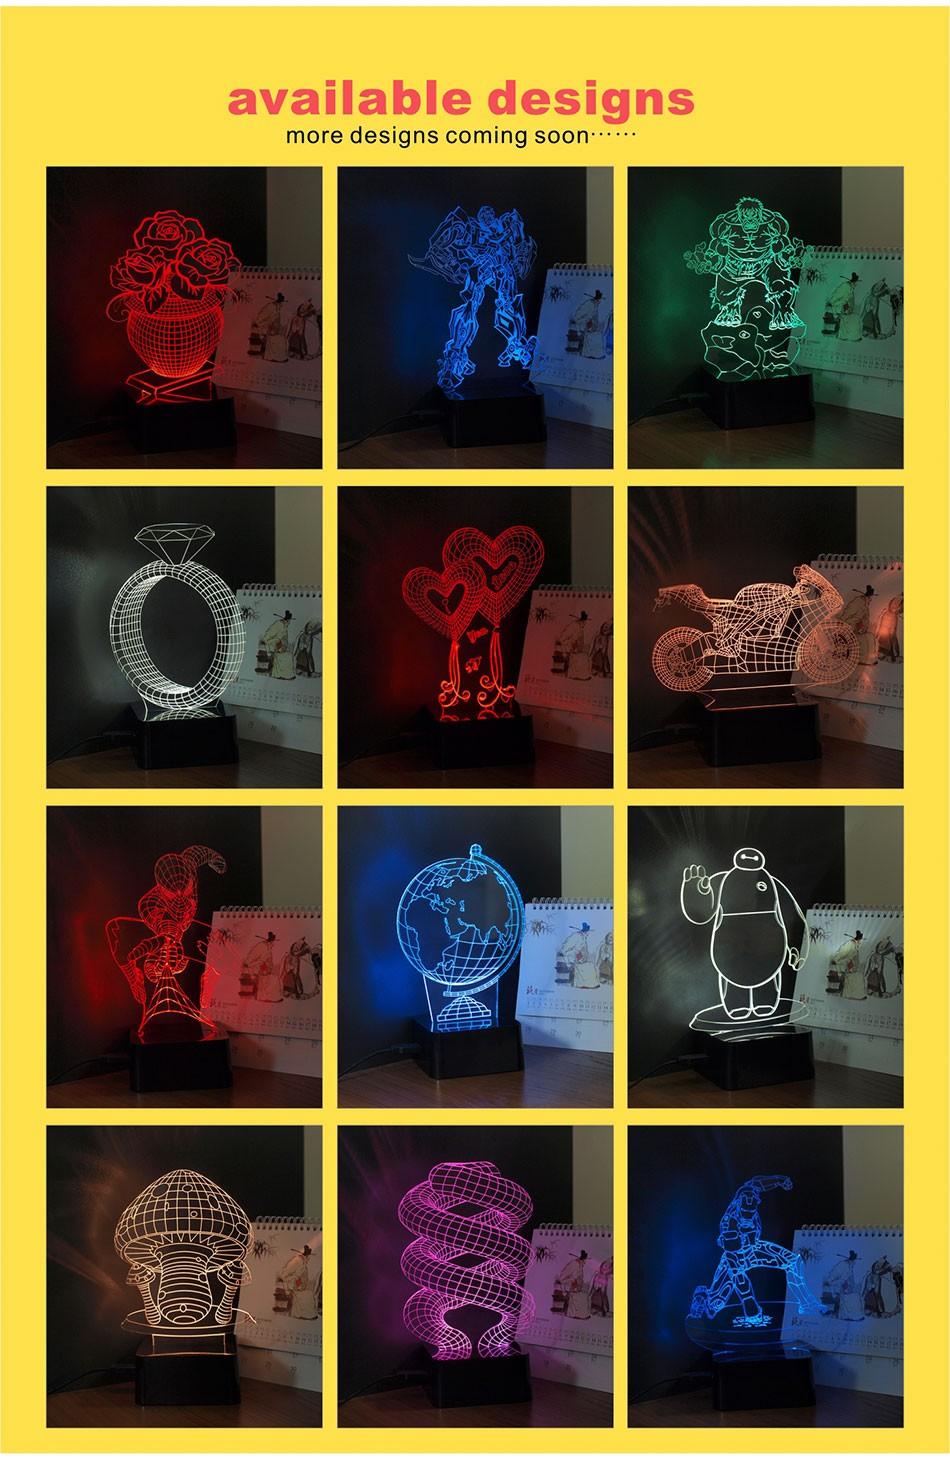 CNHIDEE Lampada Decorativa USB Desk 3D Night Lamp Bluetooth Music Led Table Lamp as Creative Gifts for Cartoon Popeye Fans (12)